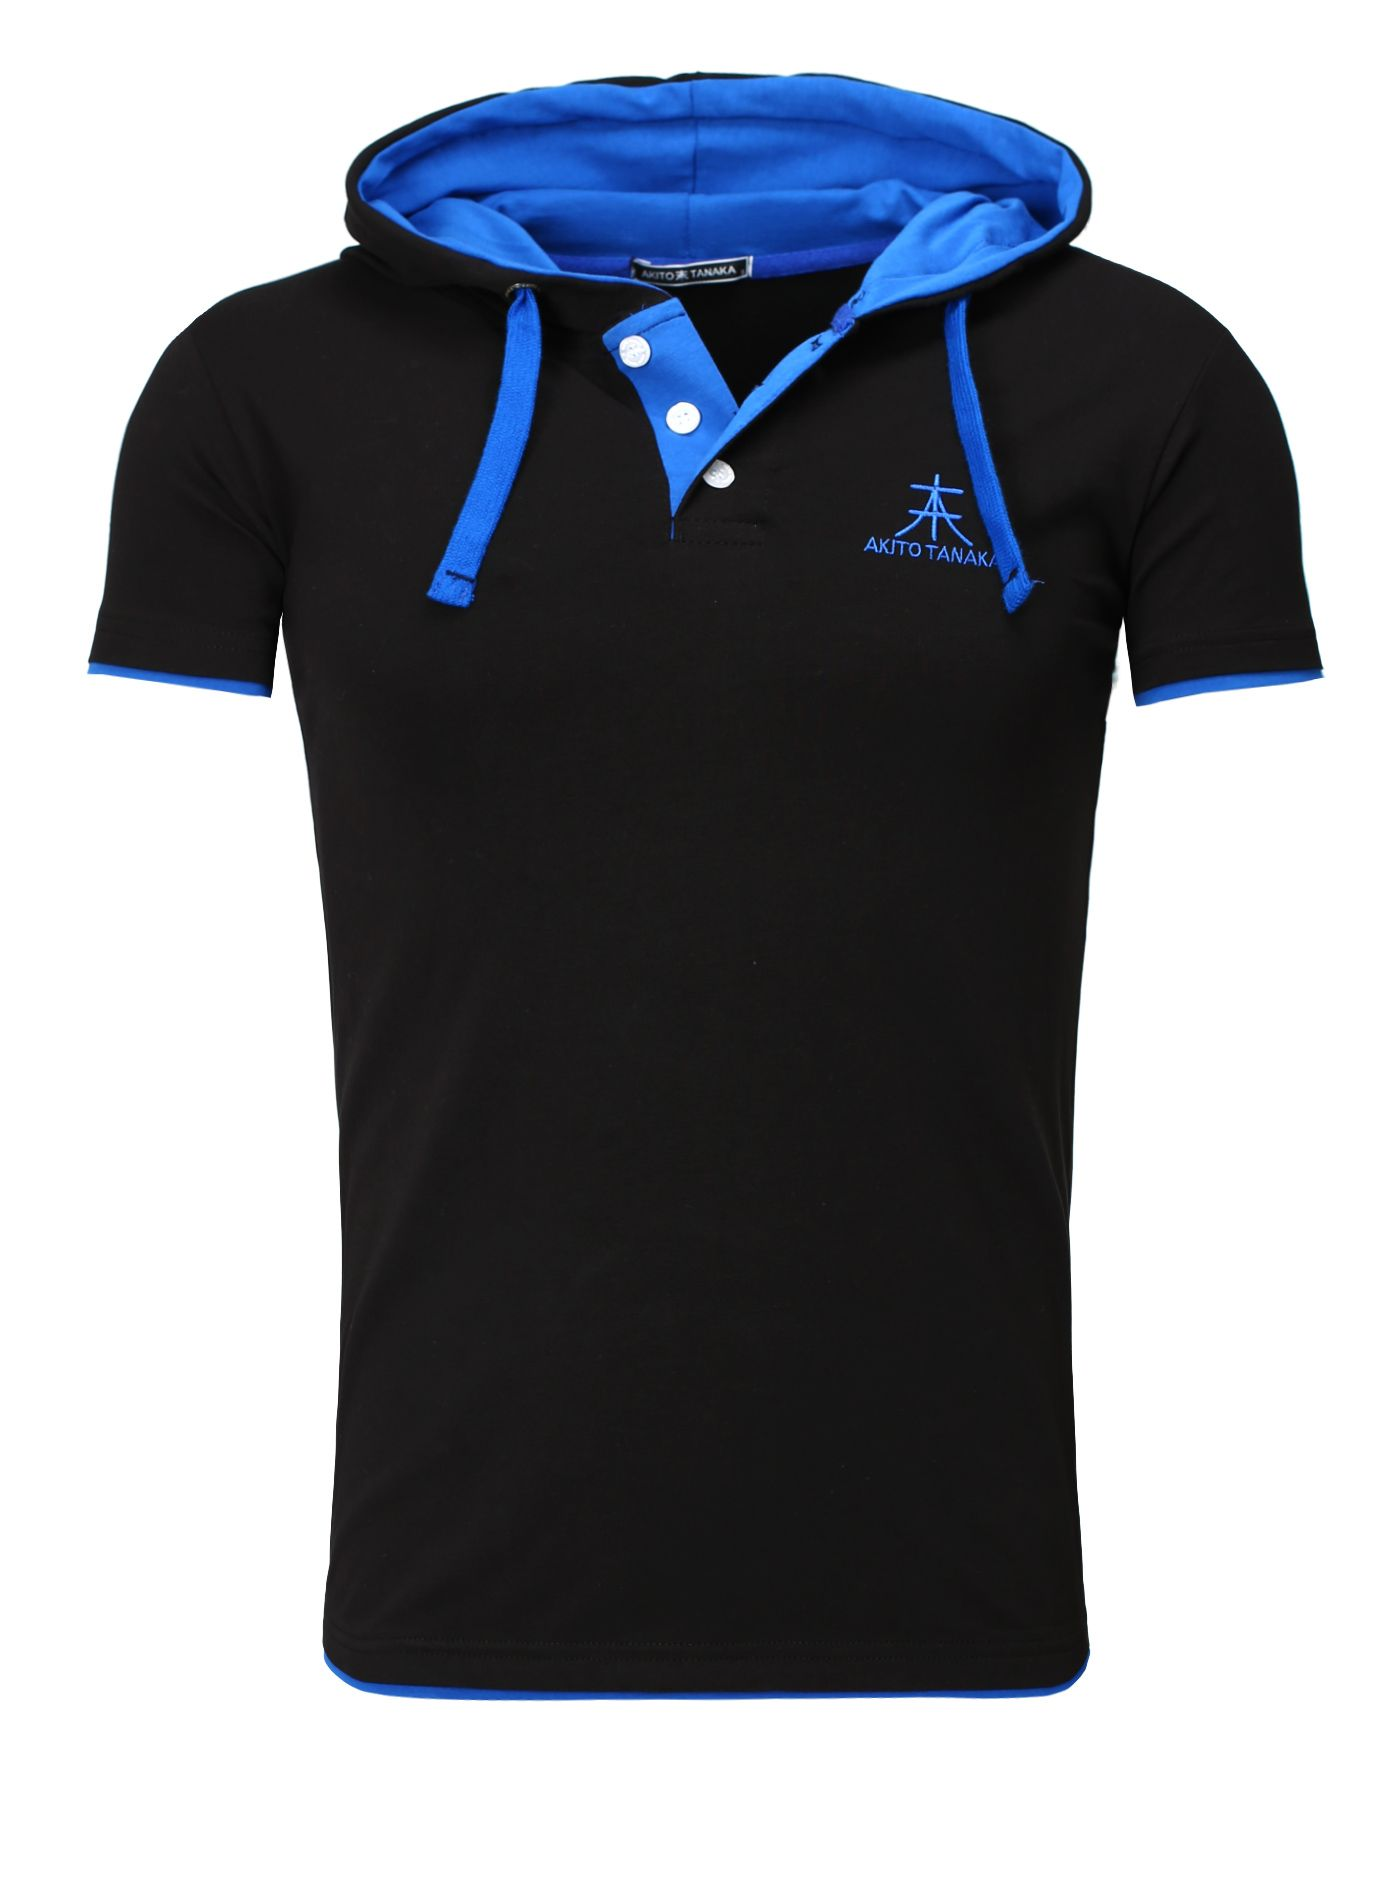 Akito Tanaka T Shirt Herren Strech schwarz | T Shirts